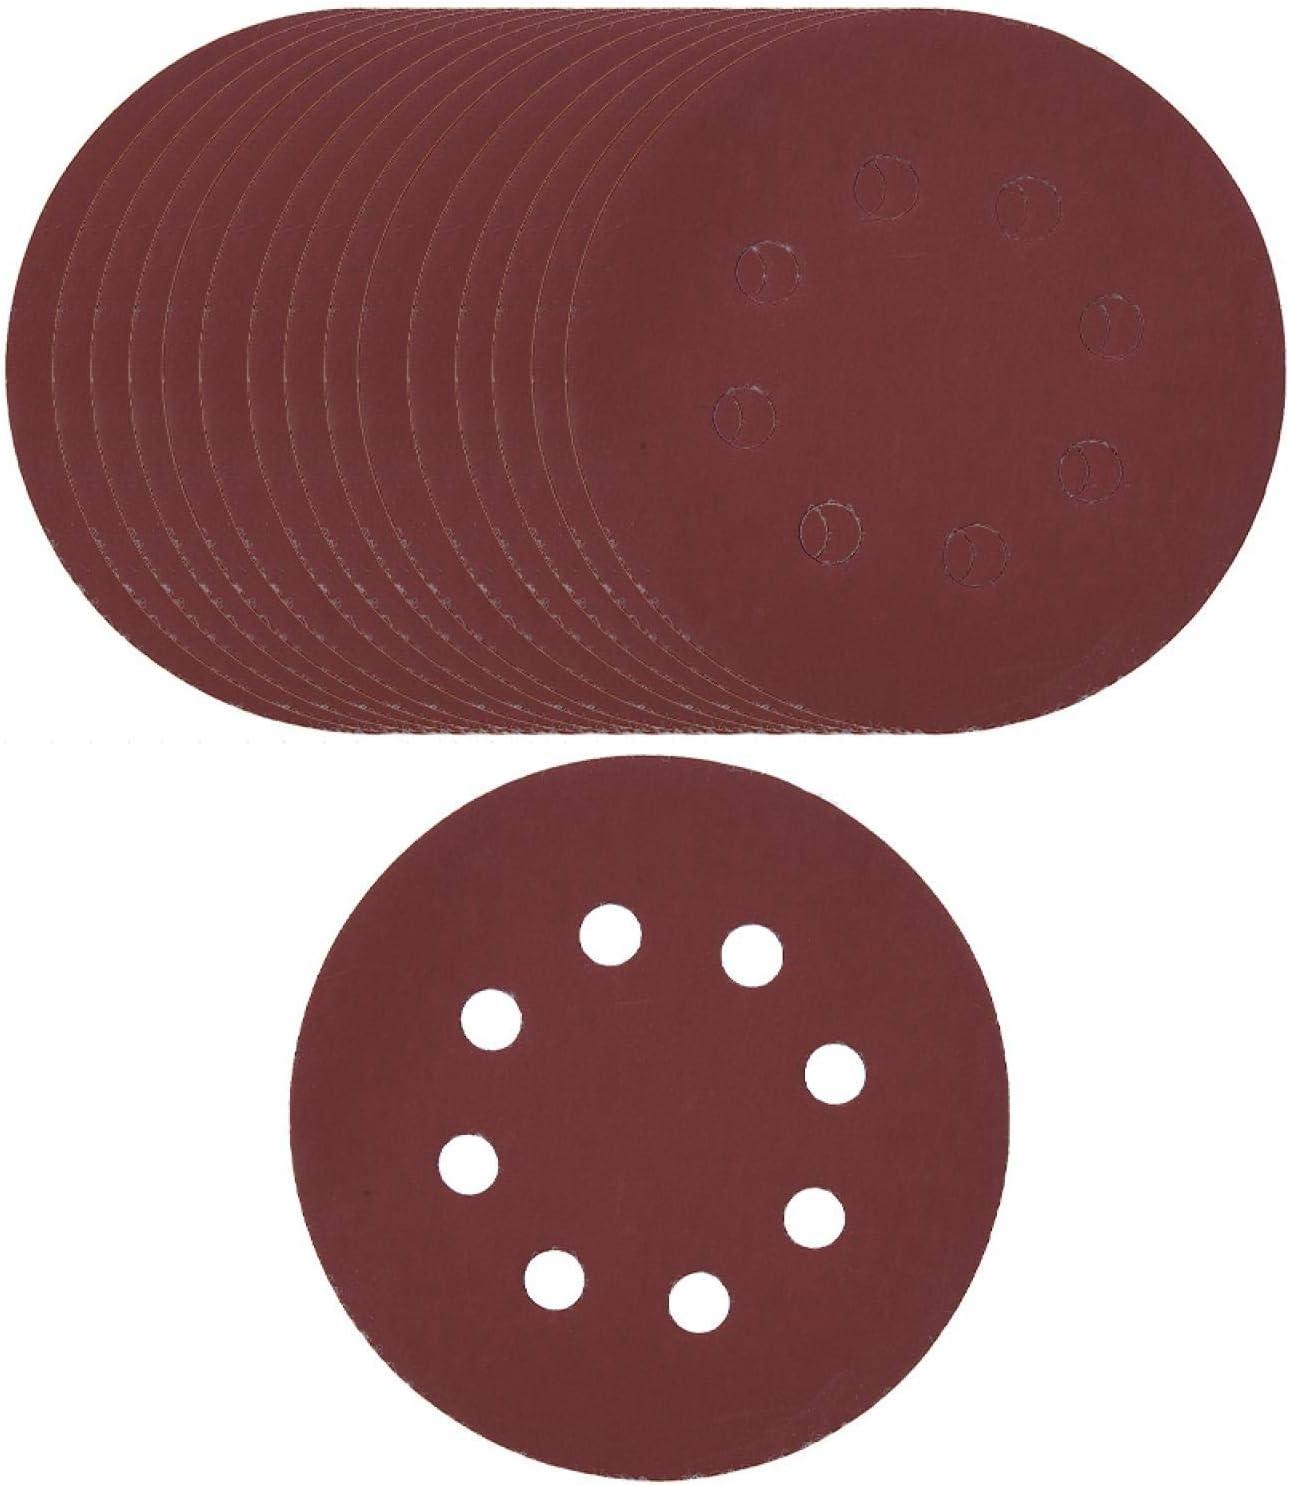 100PCS Metal Polishing 5 Import Inch 8 Discs Sanding Woo Ranking TOP8 Hole for